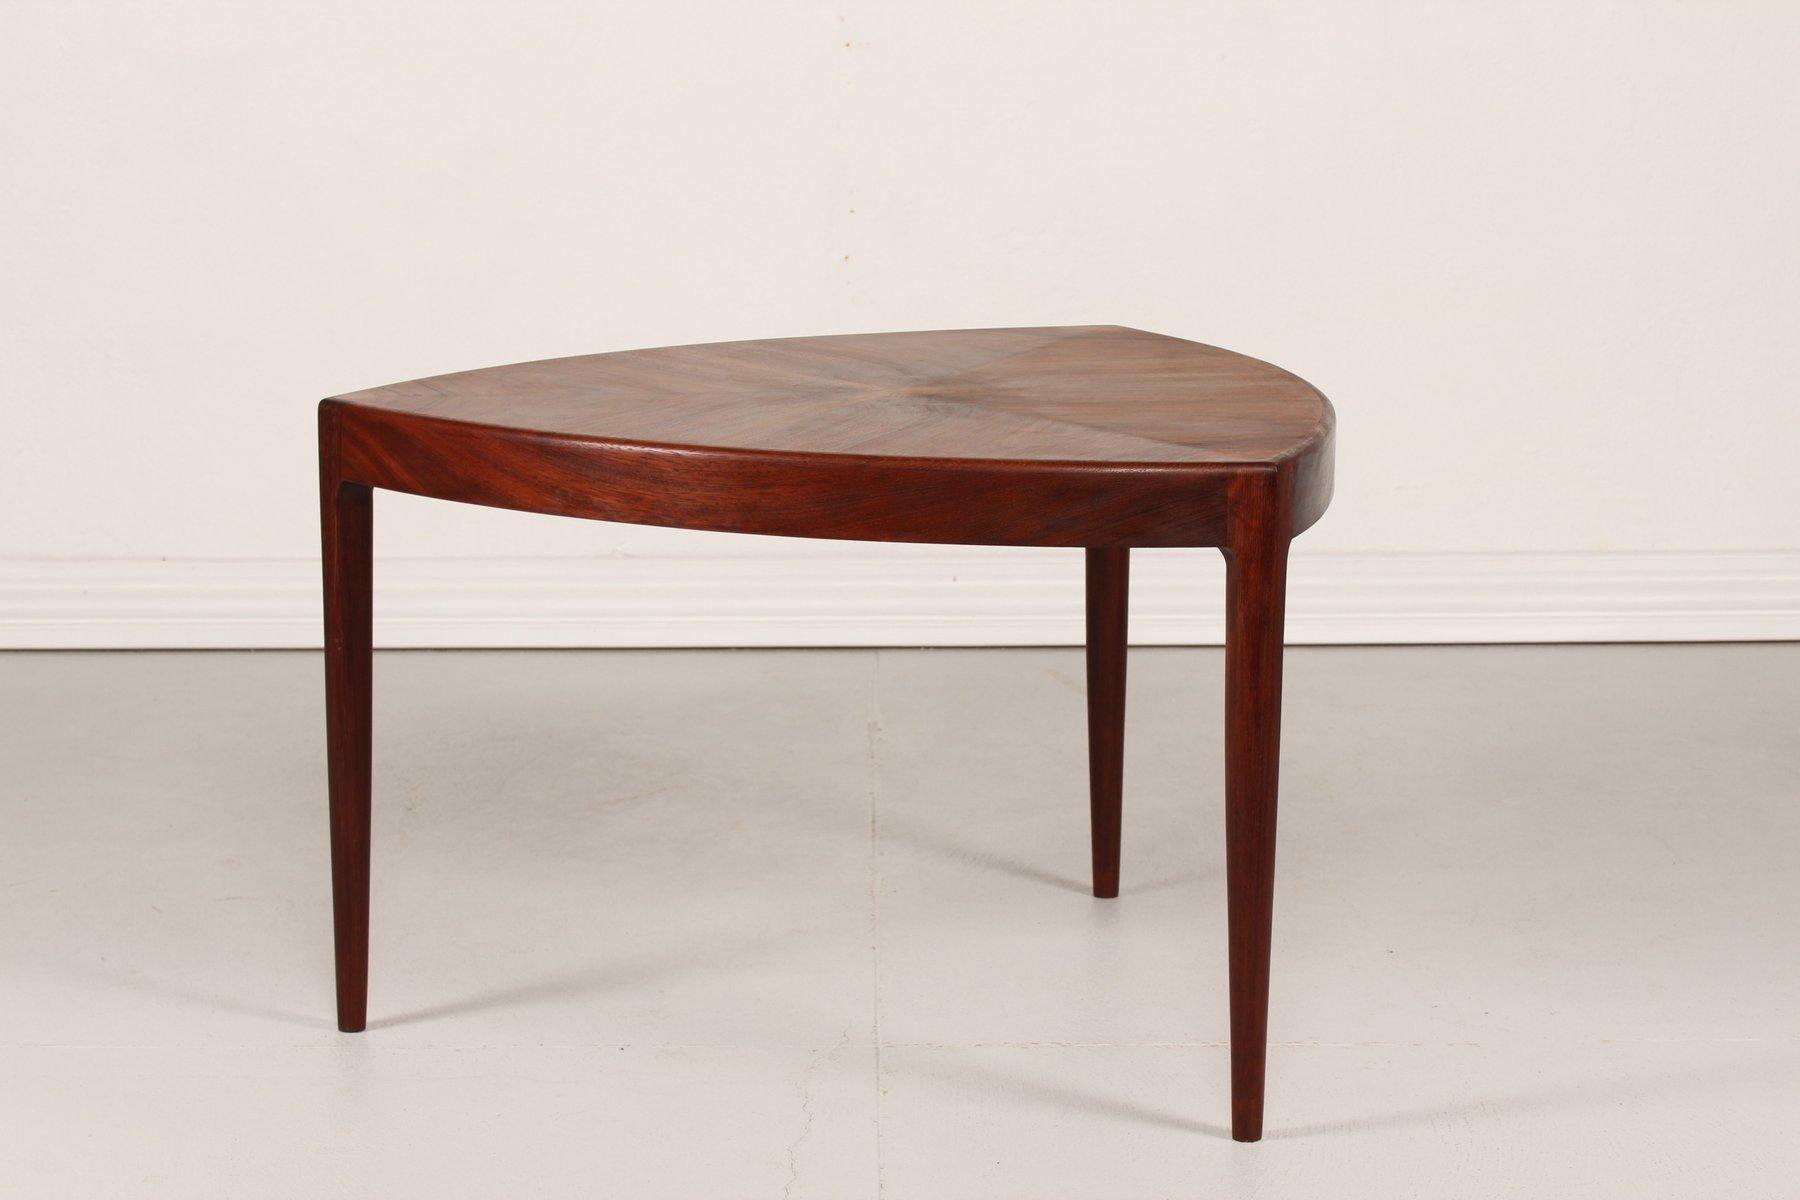 Vintage Danish Triangular Coffee Table, 1950s